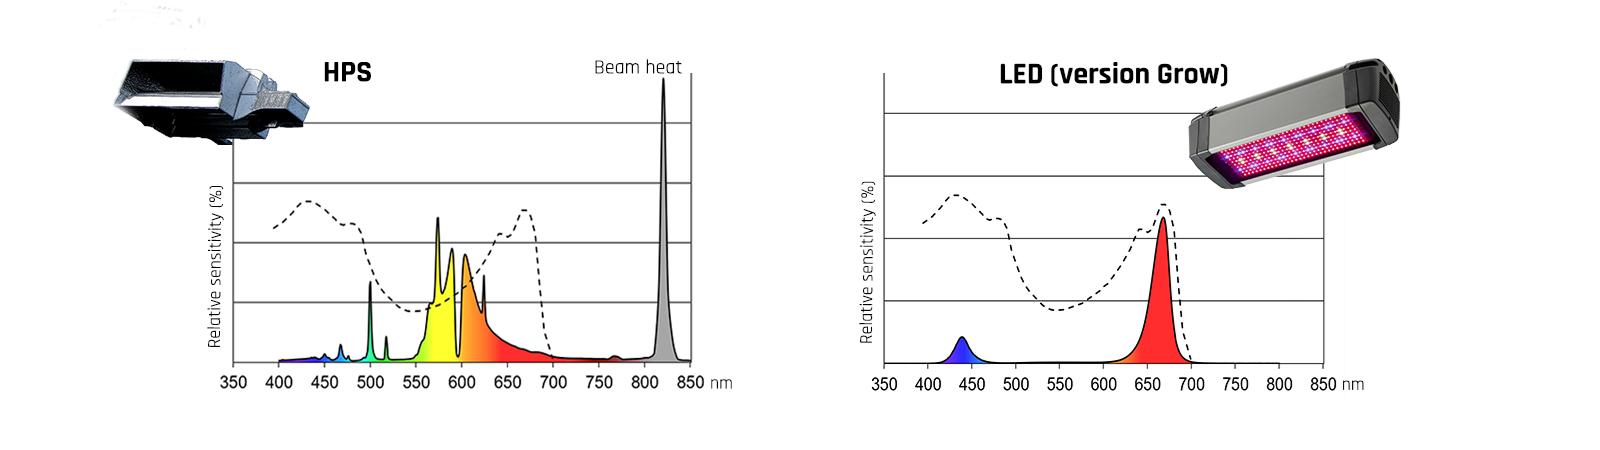 HPS vs LED - tradition vs future-proofing